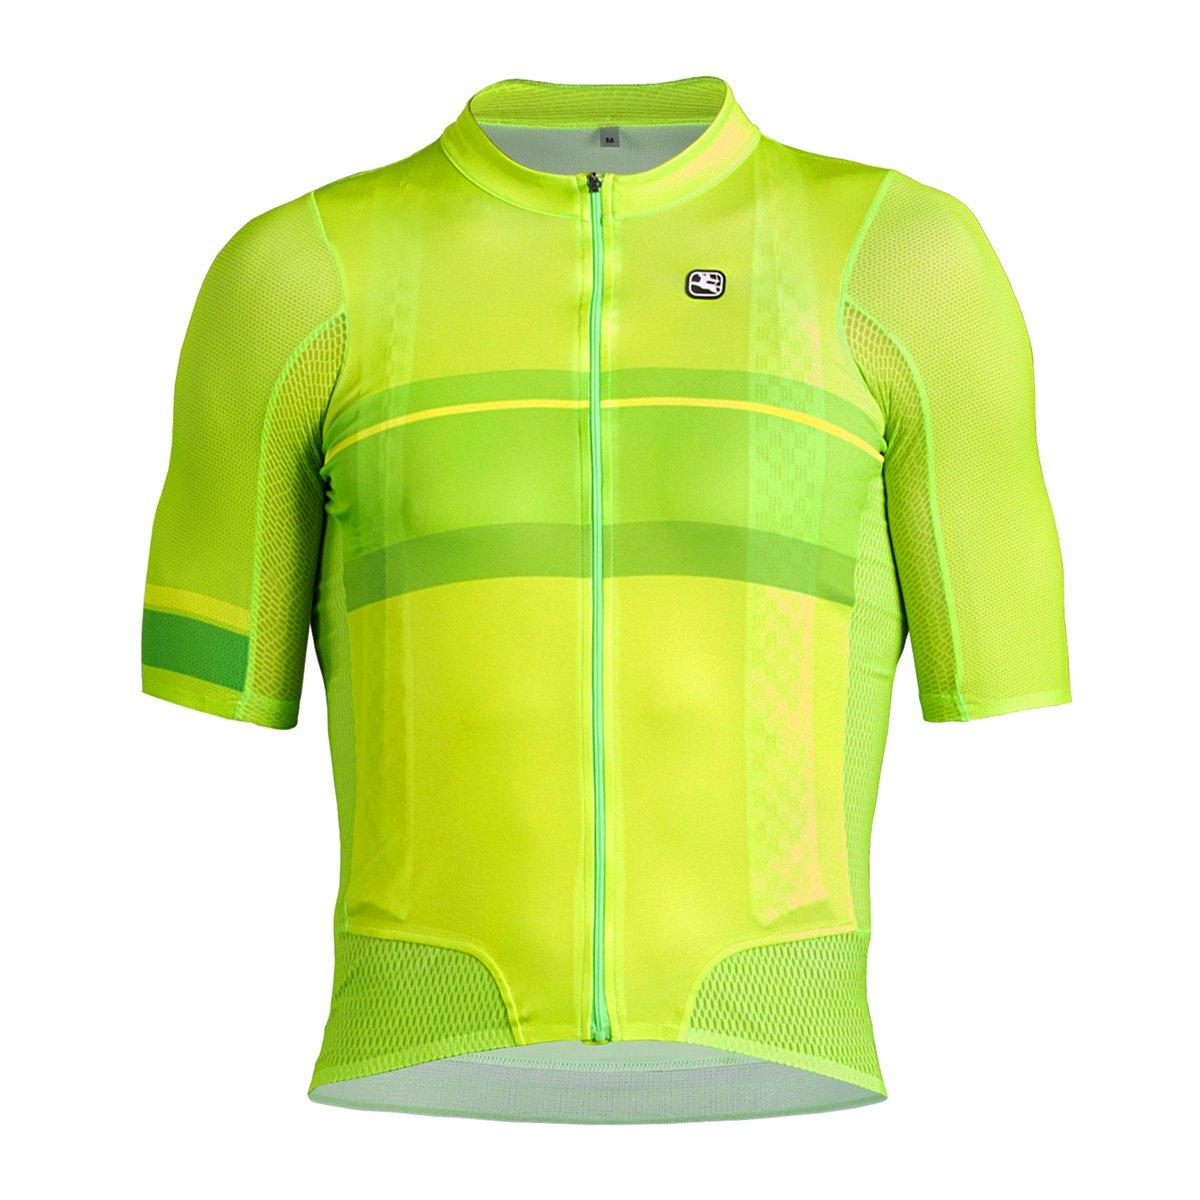 Amazon.com   Giordana NX-G Air Road Bike Jersey - Men s   Sports   Outdoors d0549759e